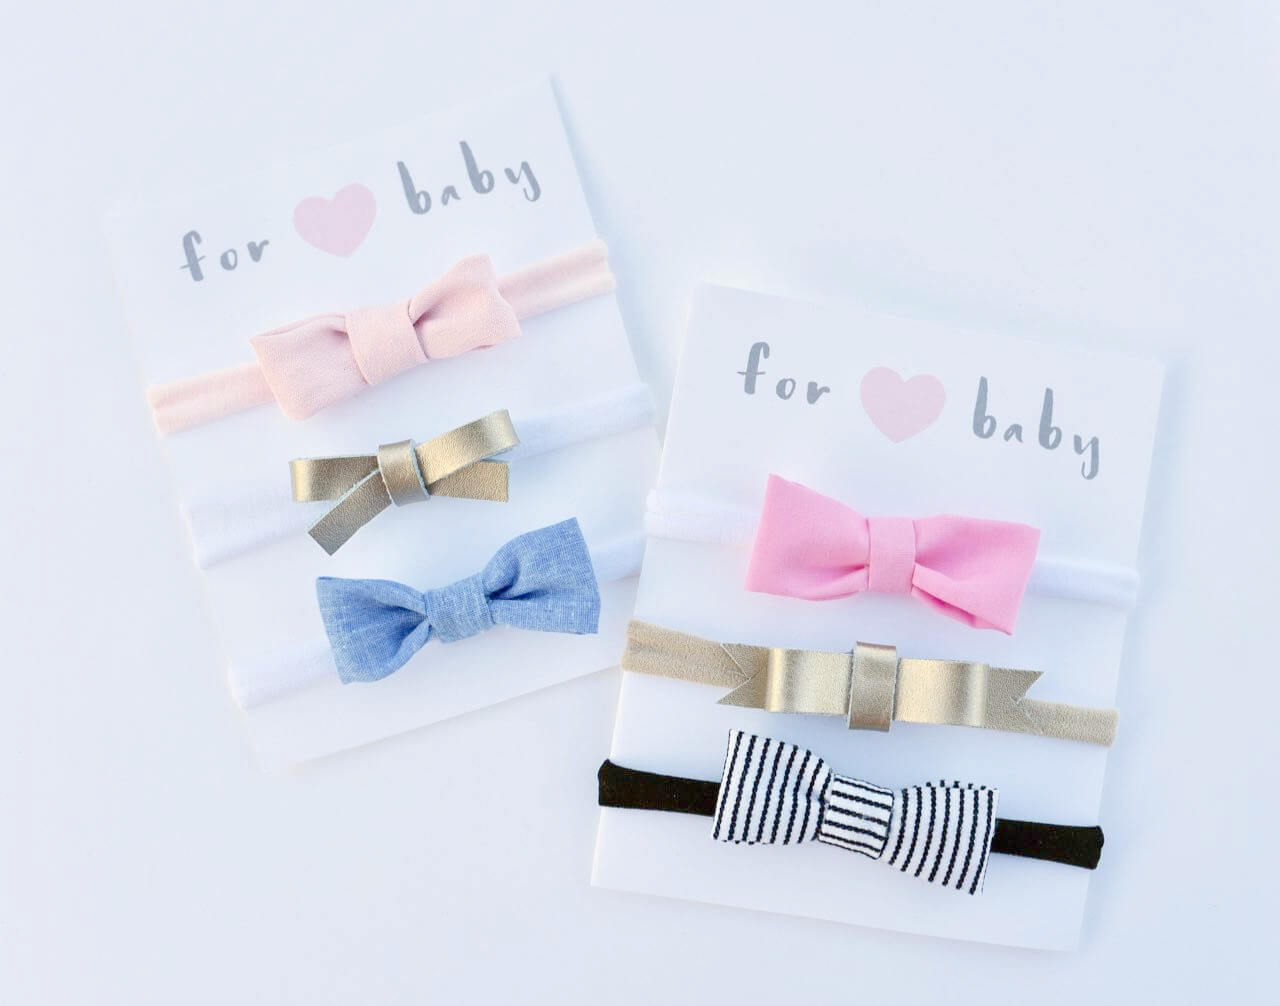 Free Printable Hair Bow Cards For Diy Hair Bows And Inside Headband Card Template